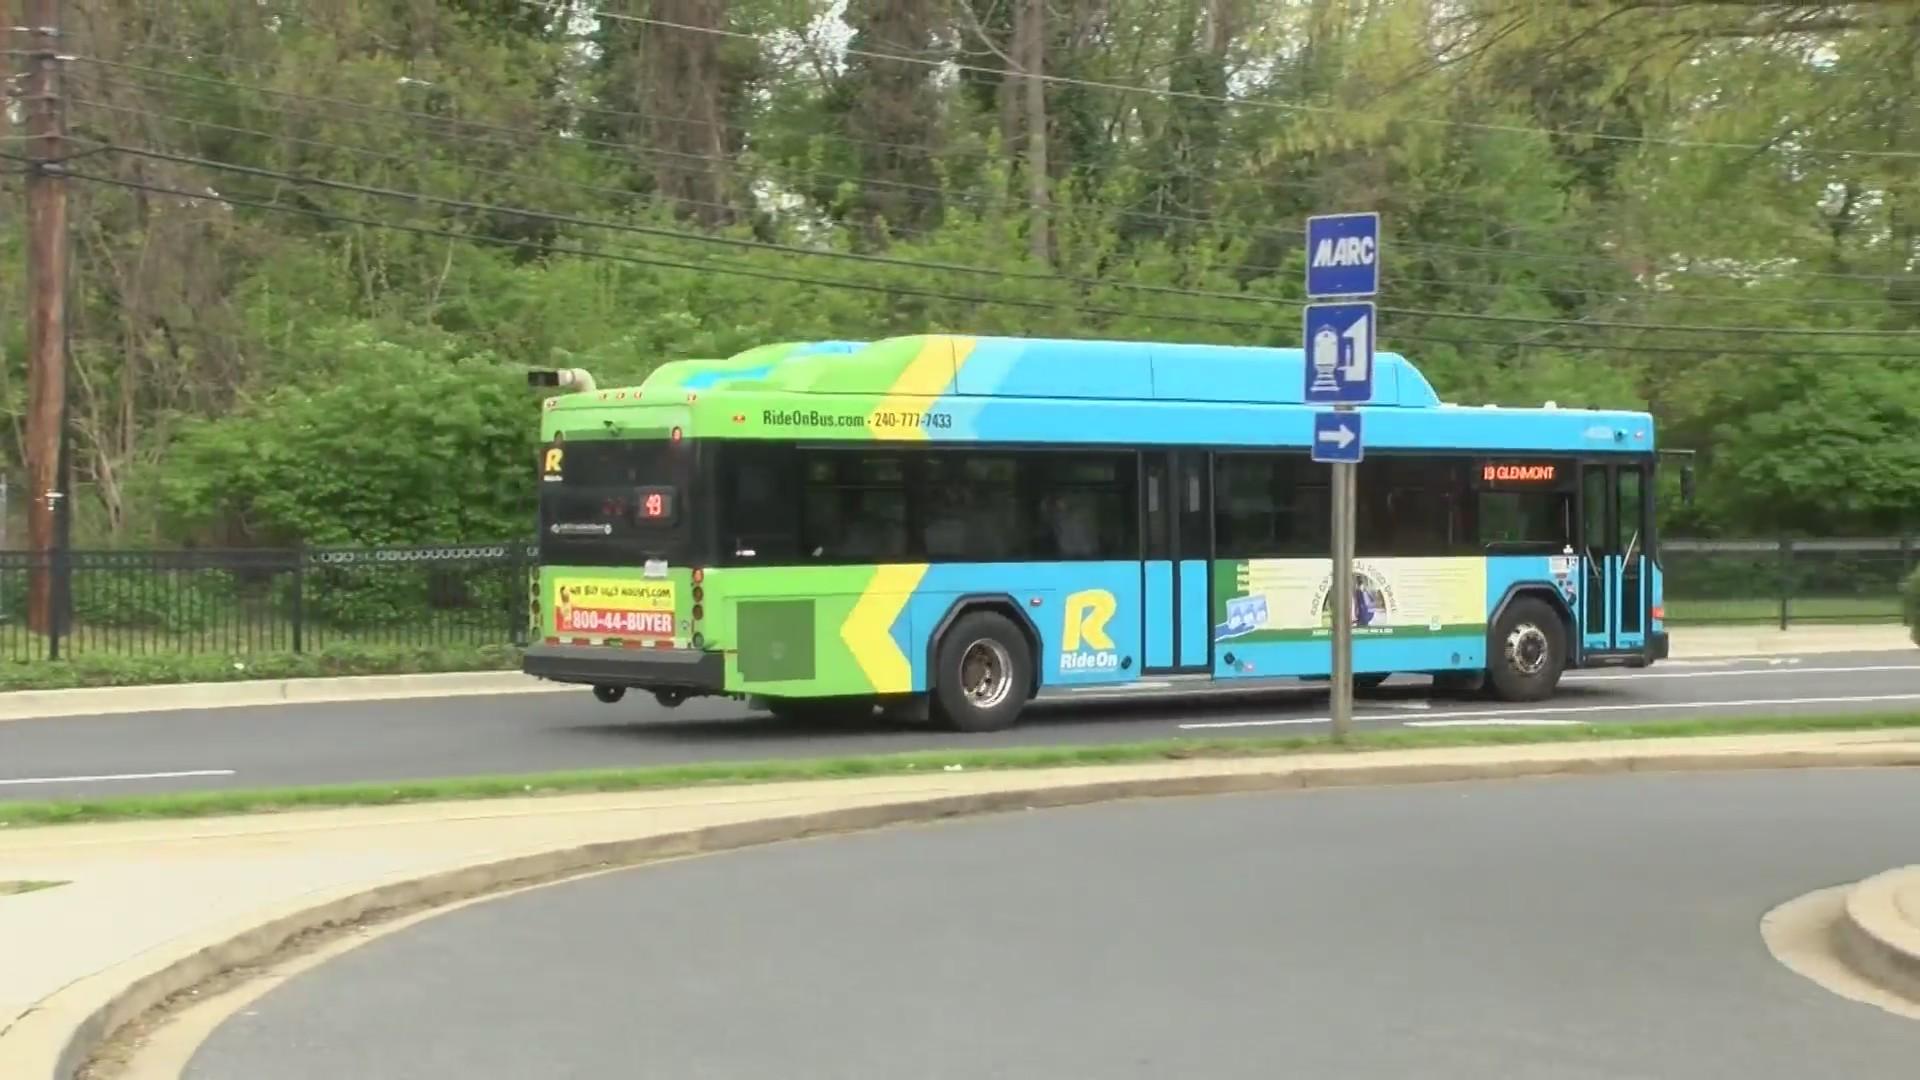 MCDOT works on new program for on-demand bus pickup service